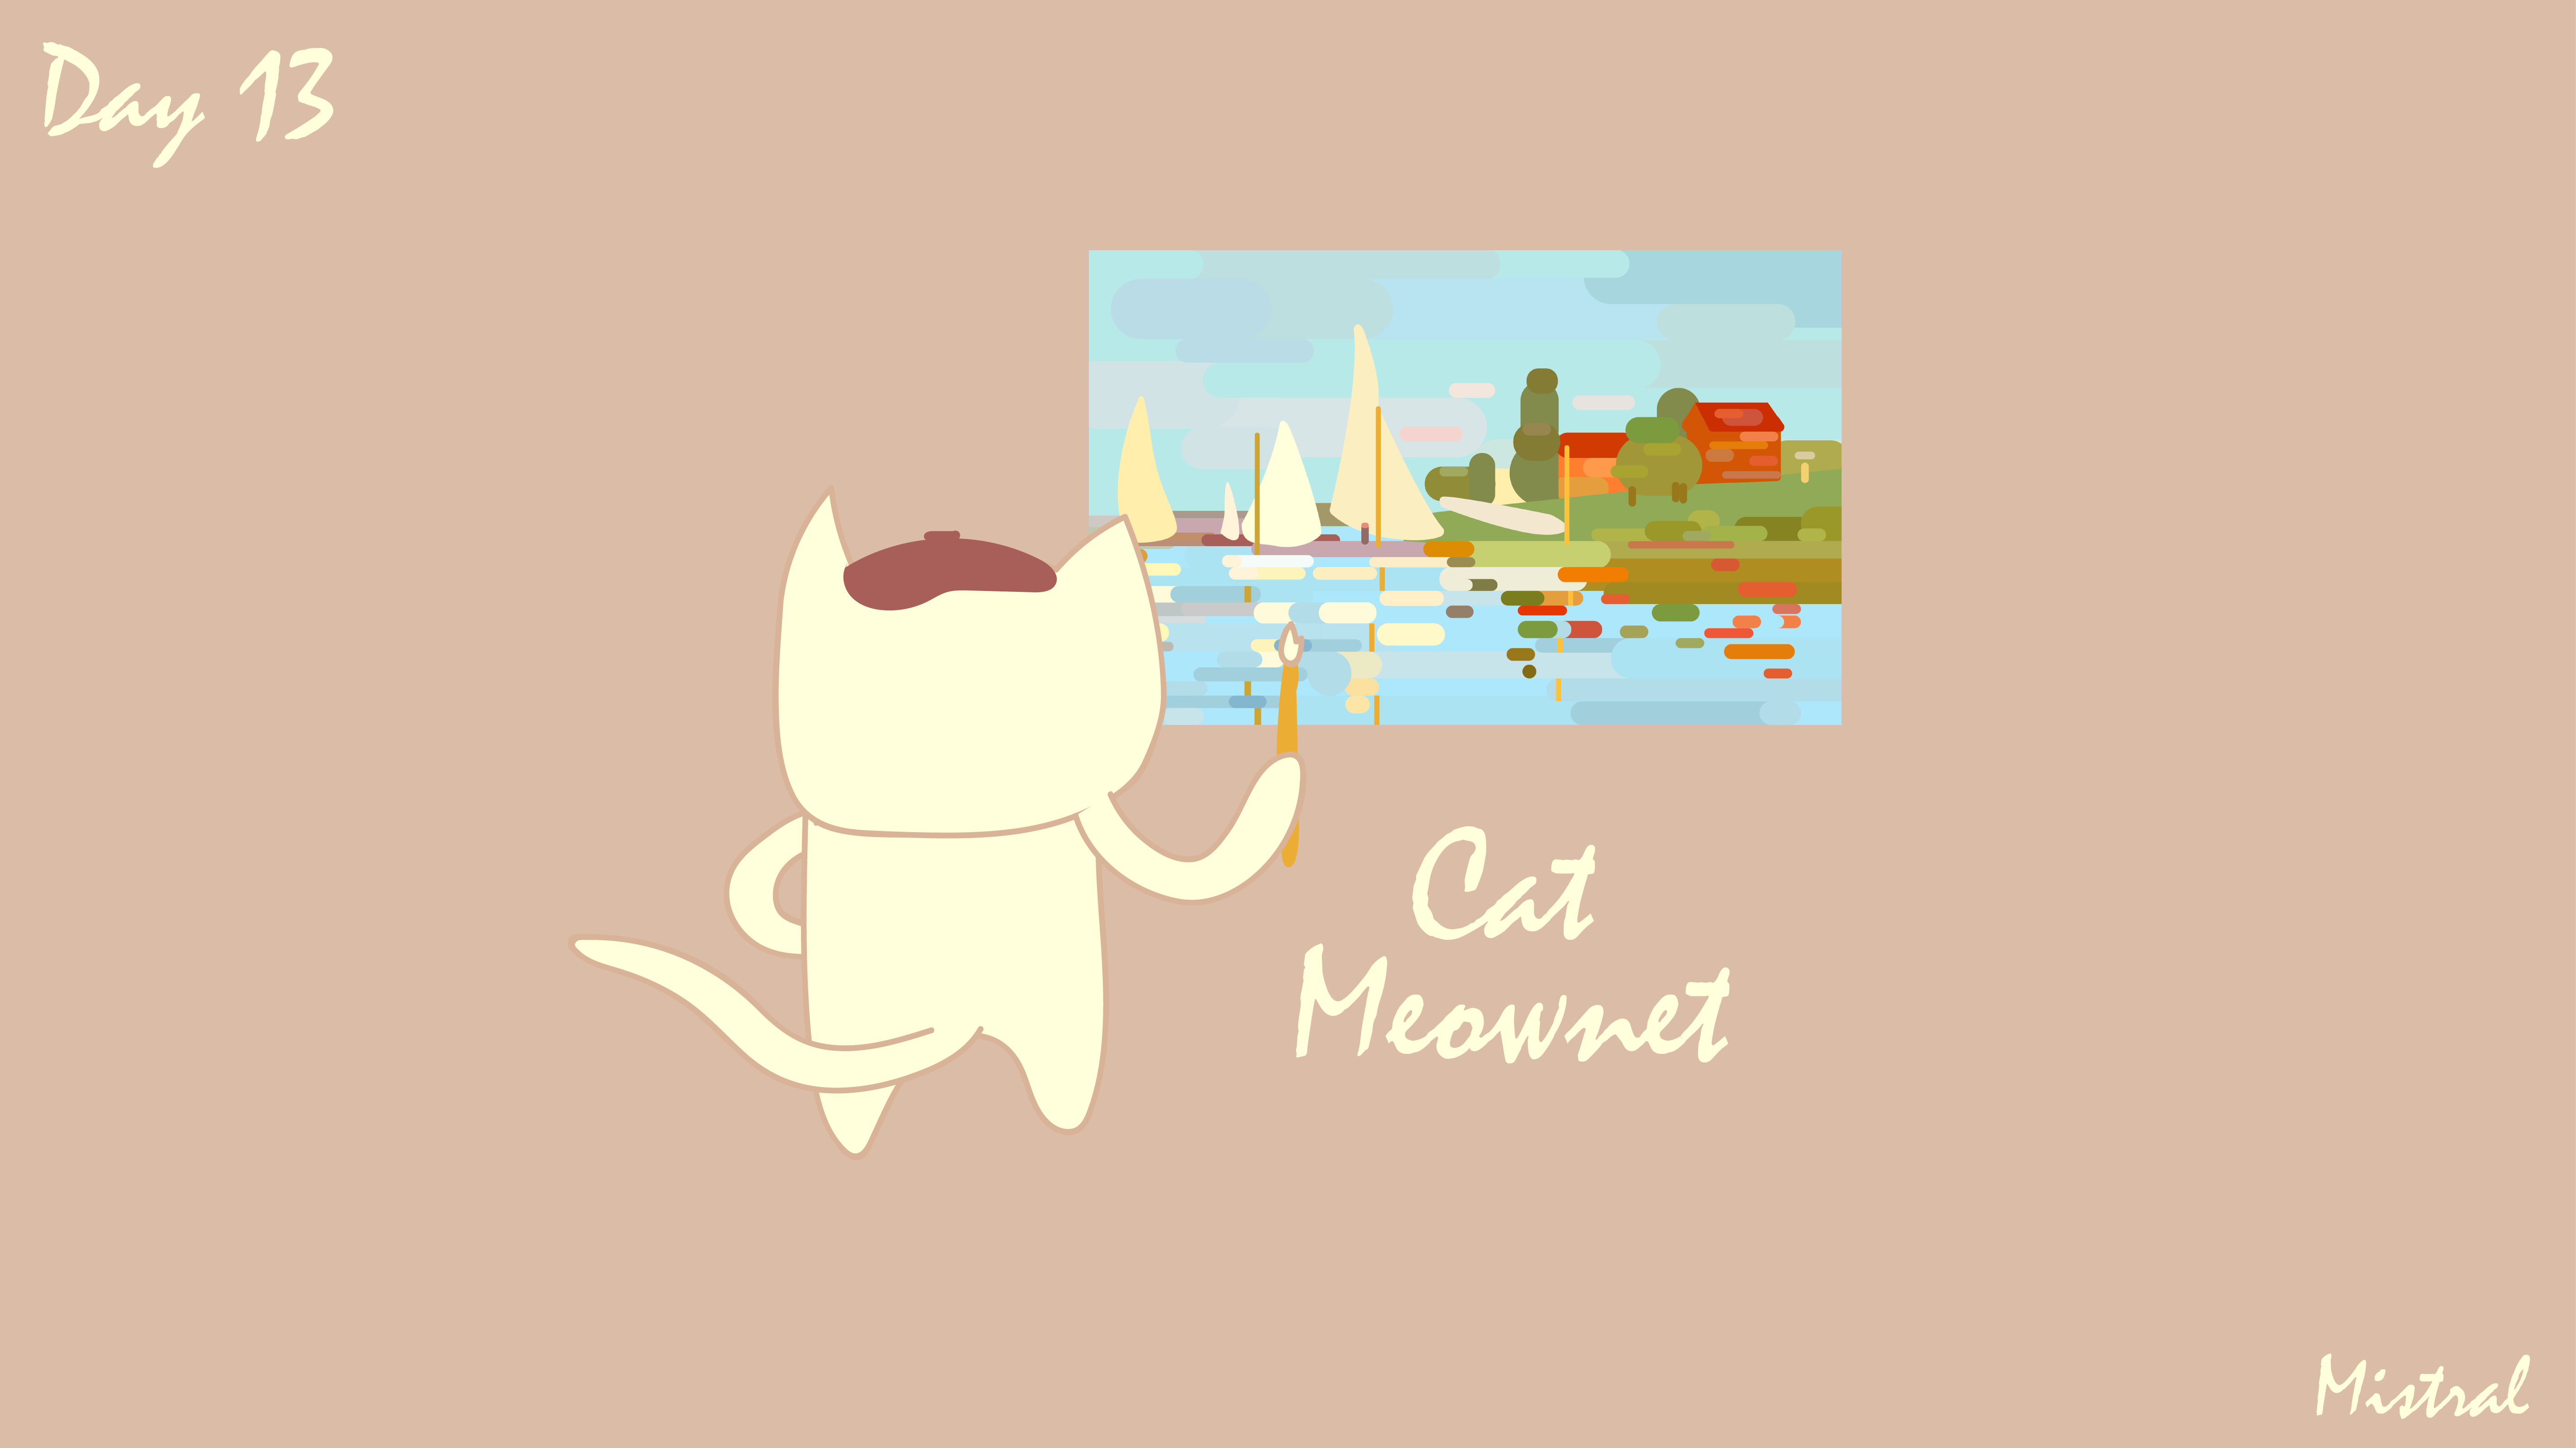 [cat]day1-13